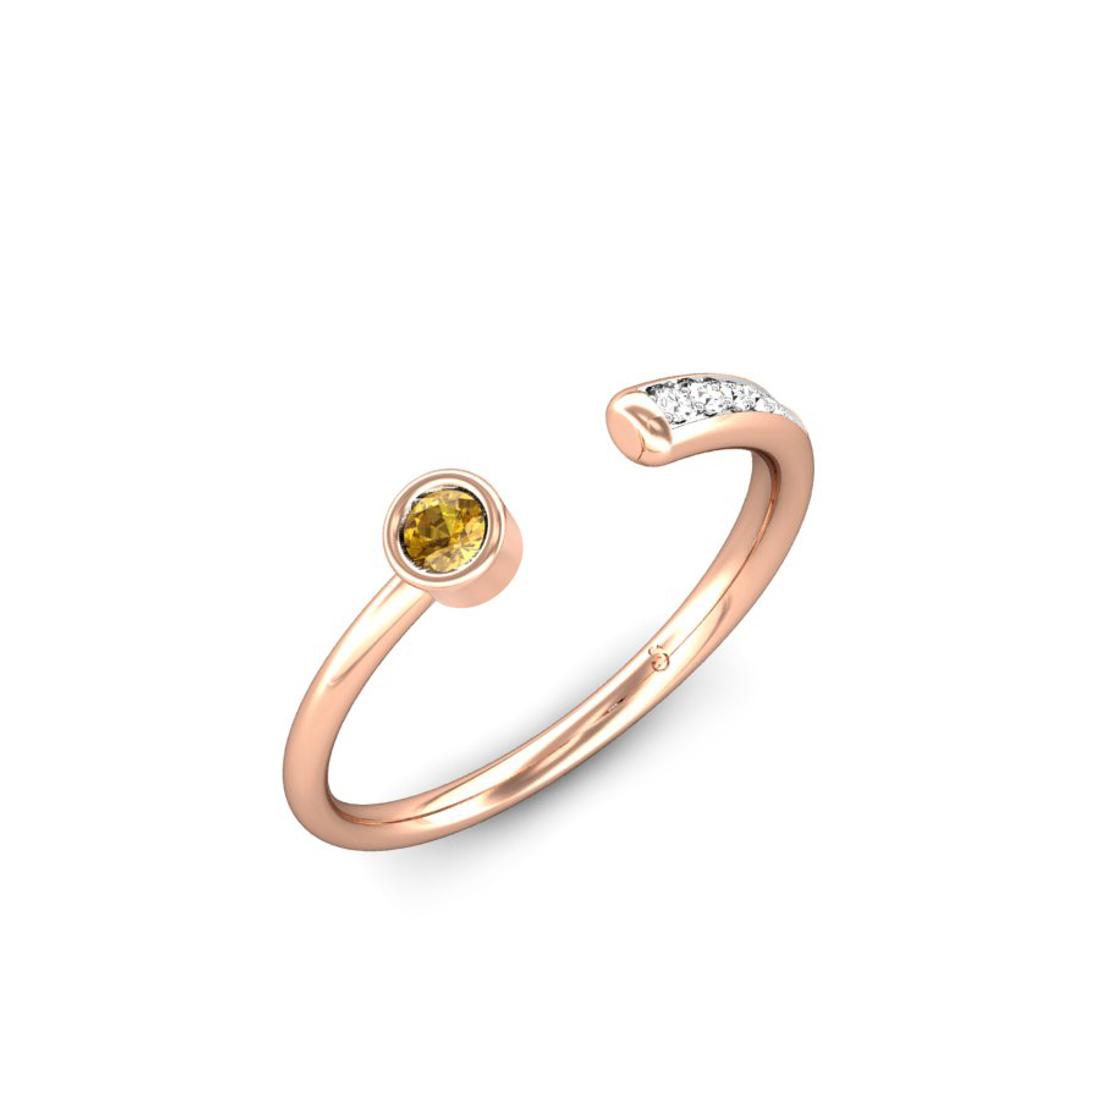 Jewel samarth 18k(750) BIS Hallmark Rose Gold Sparkling Trail Citrine Ring (CGL Certified)